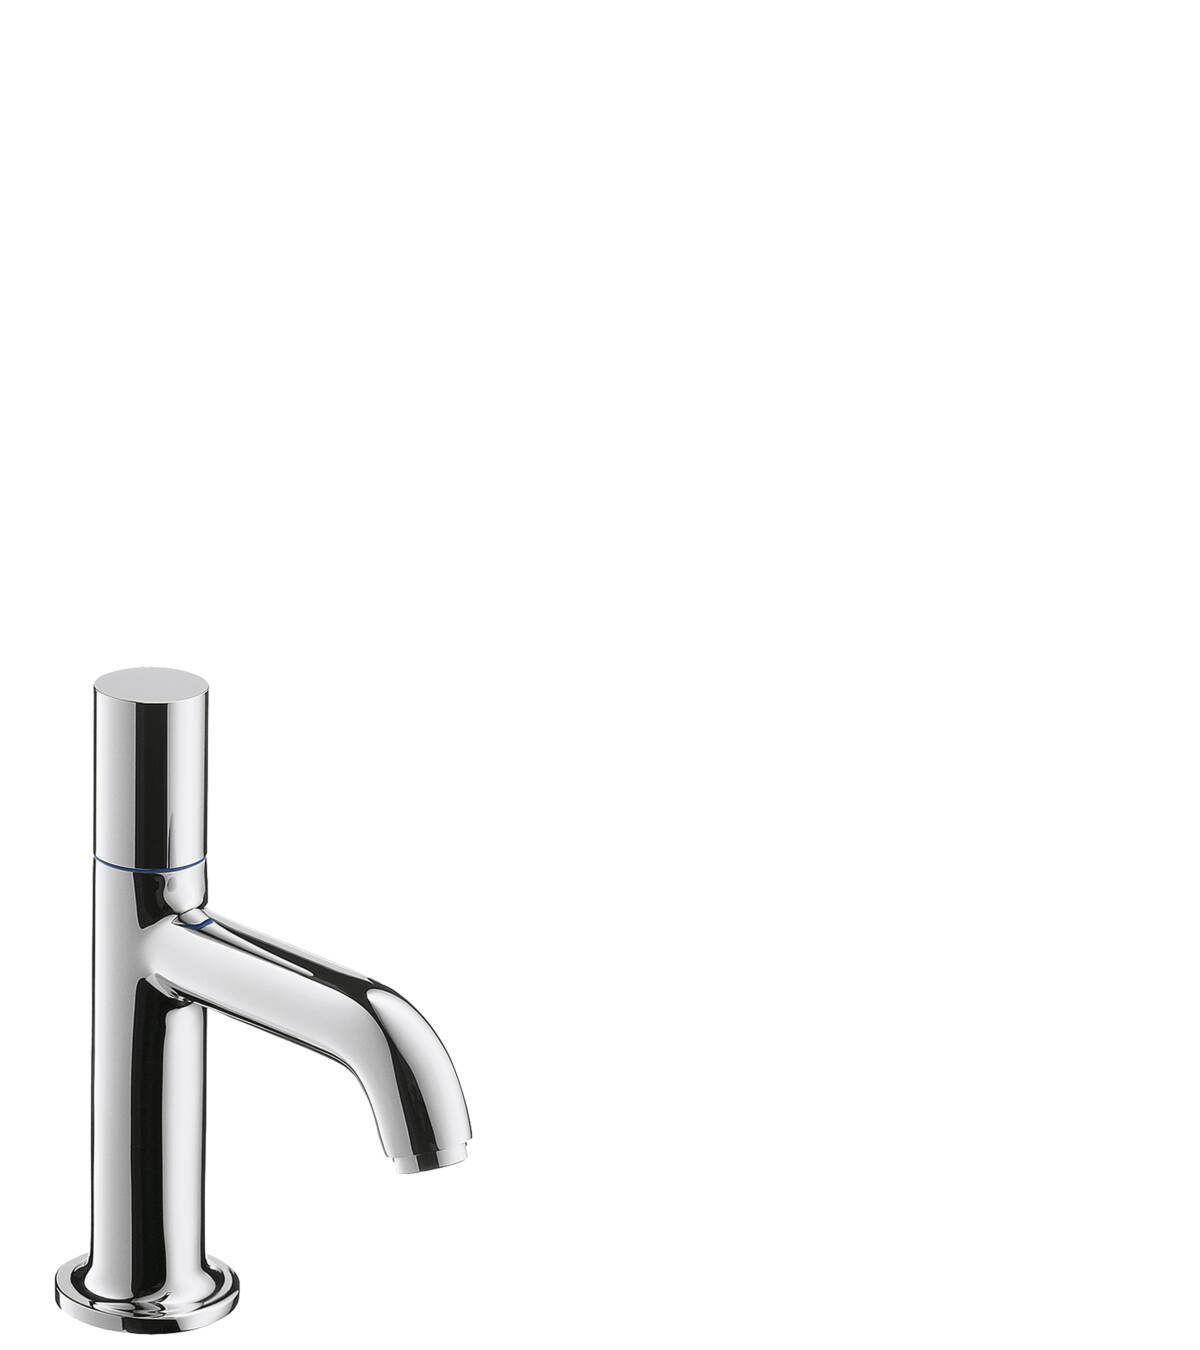 Pillar tap 70 without waste set, Chrome, 38130000